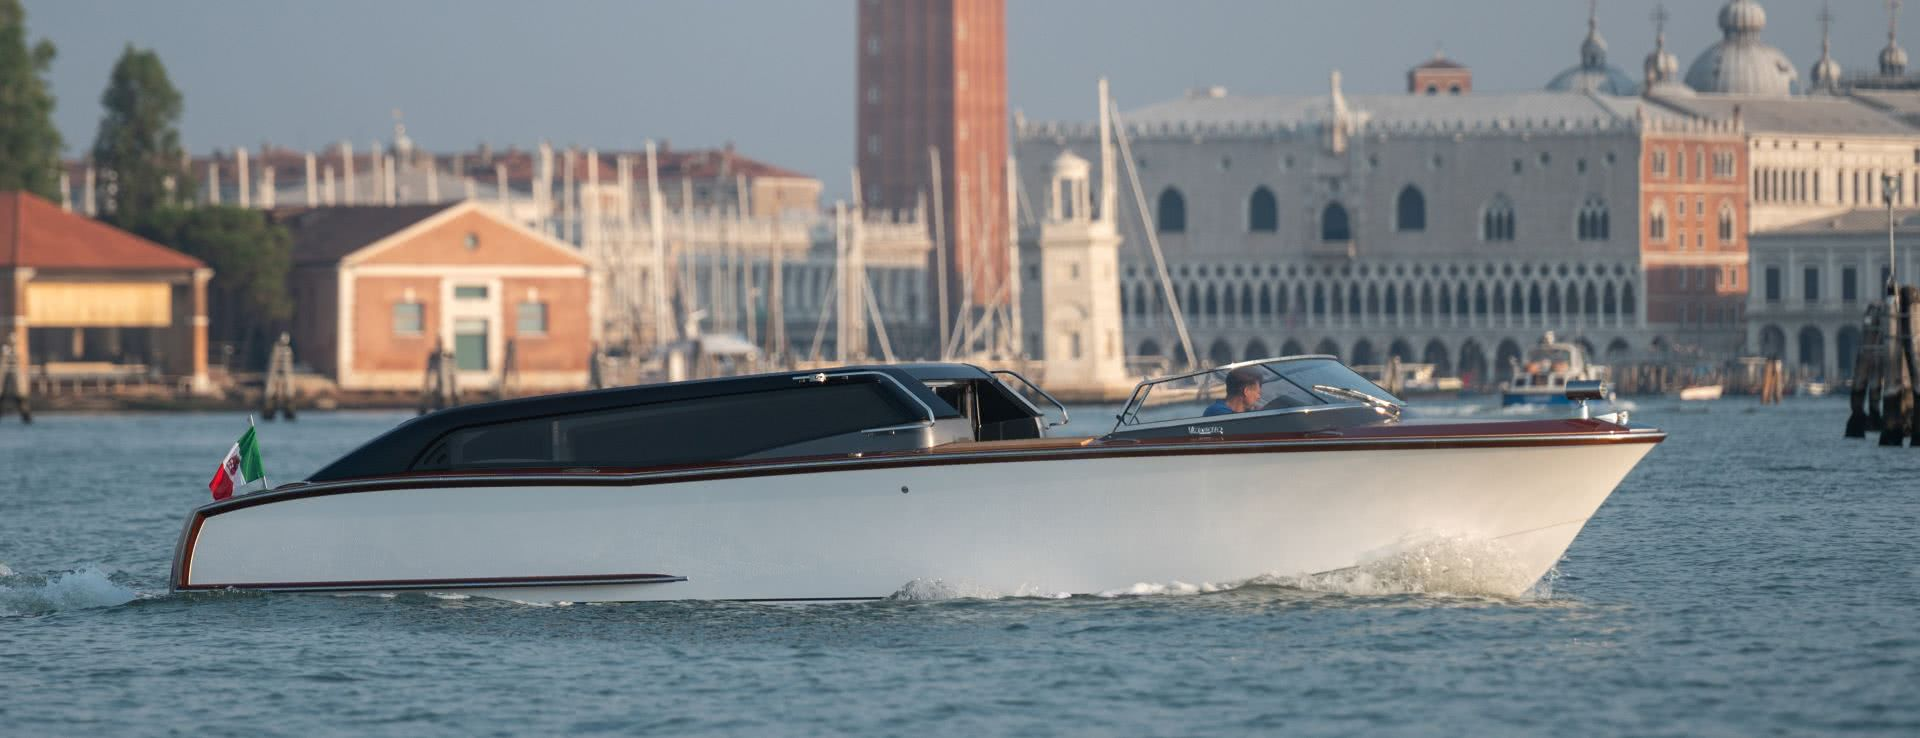 Thunder Venetian Taxi Nuvolari Lenard